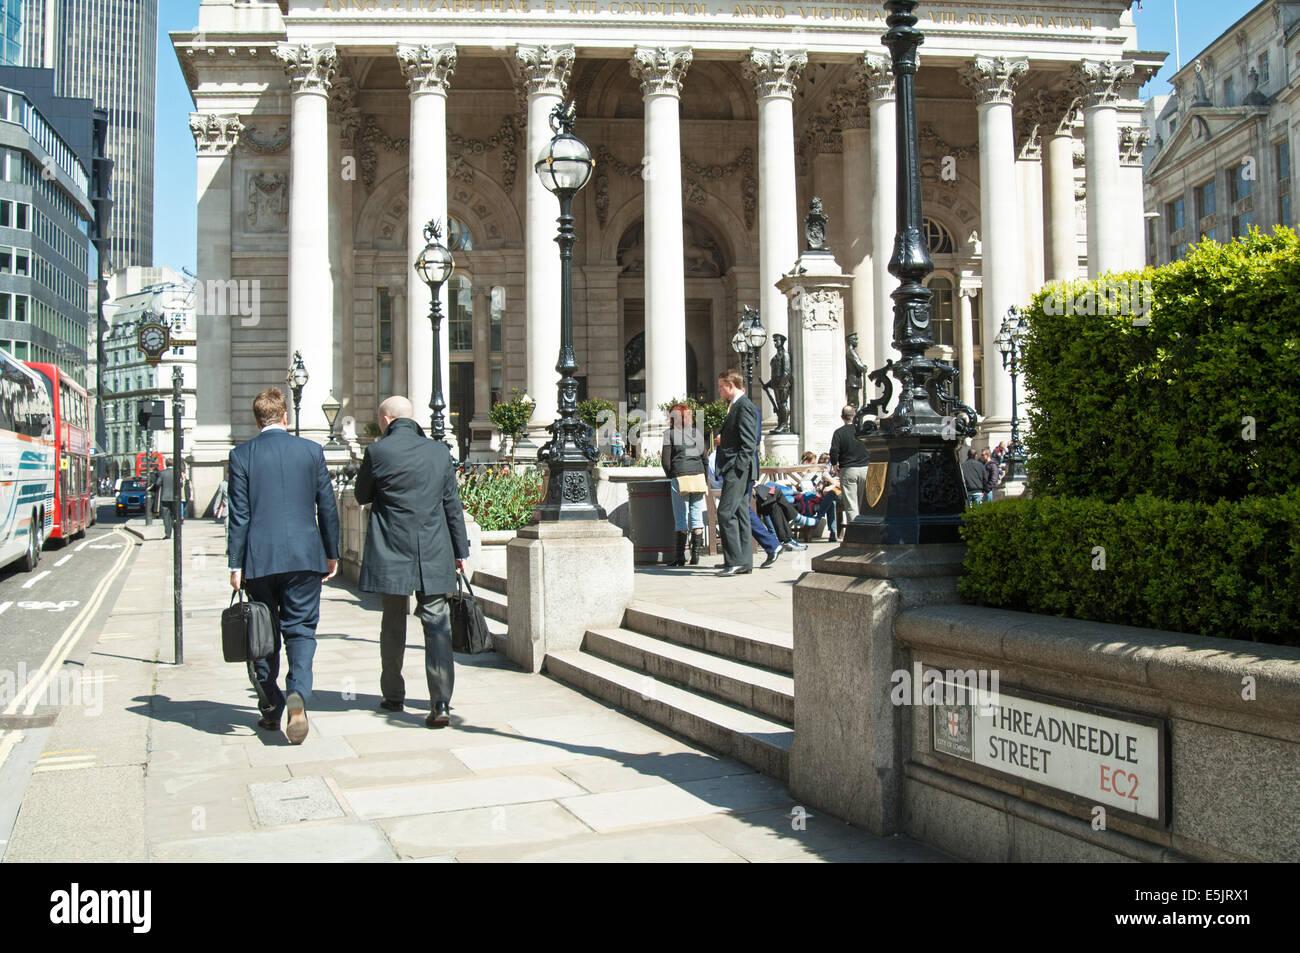 The Royal Exchange, Threadneedle Street, City of London. England. - Stock Image